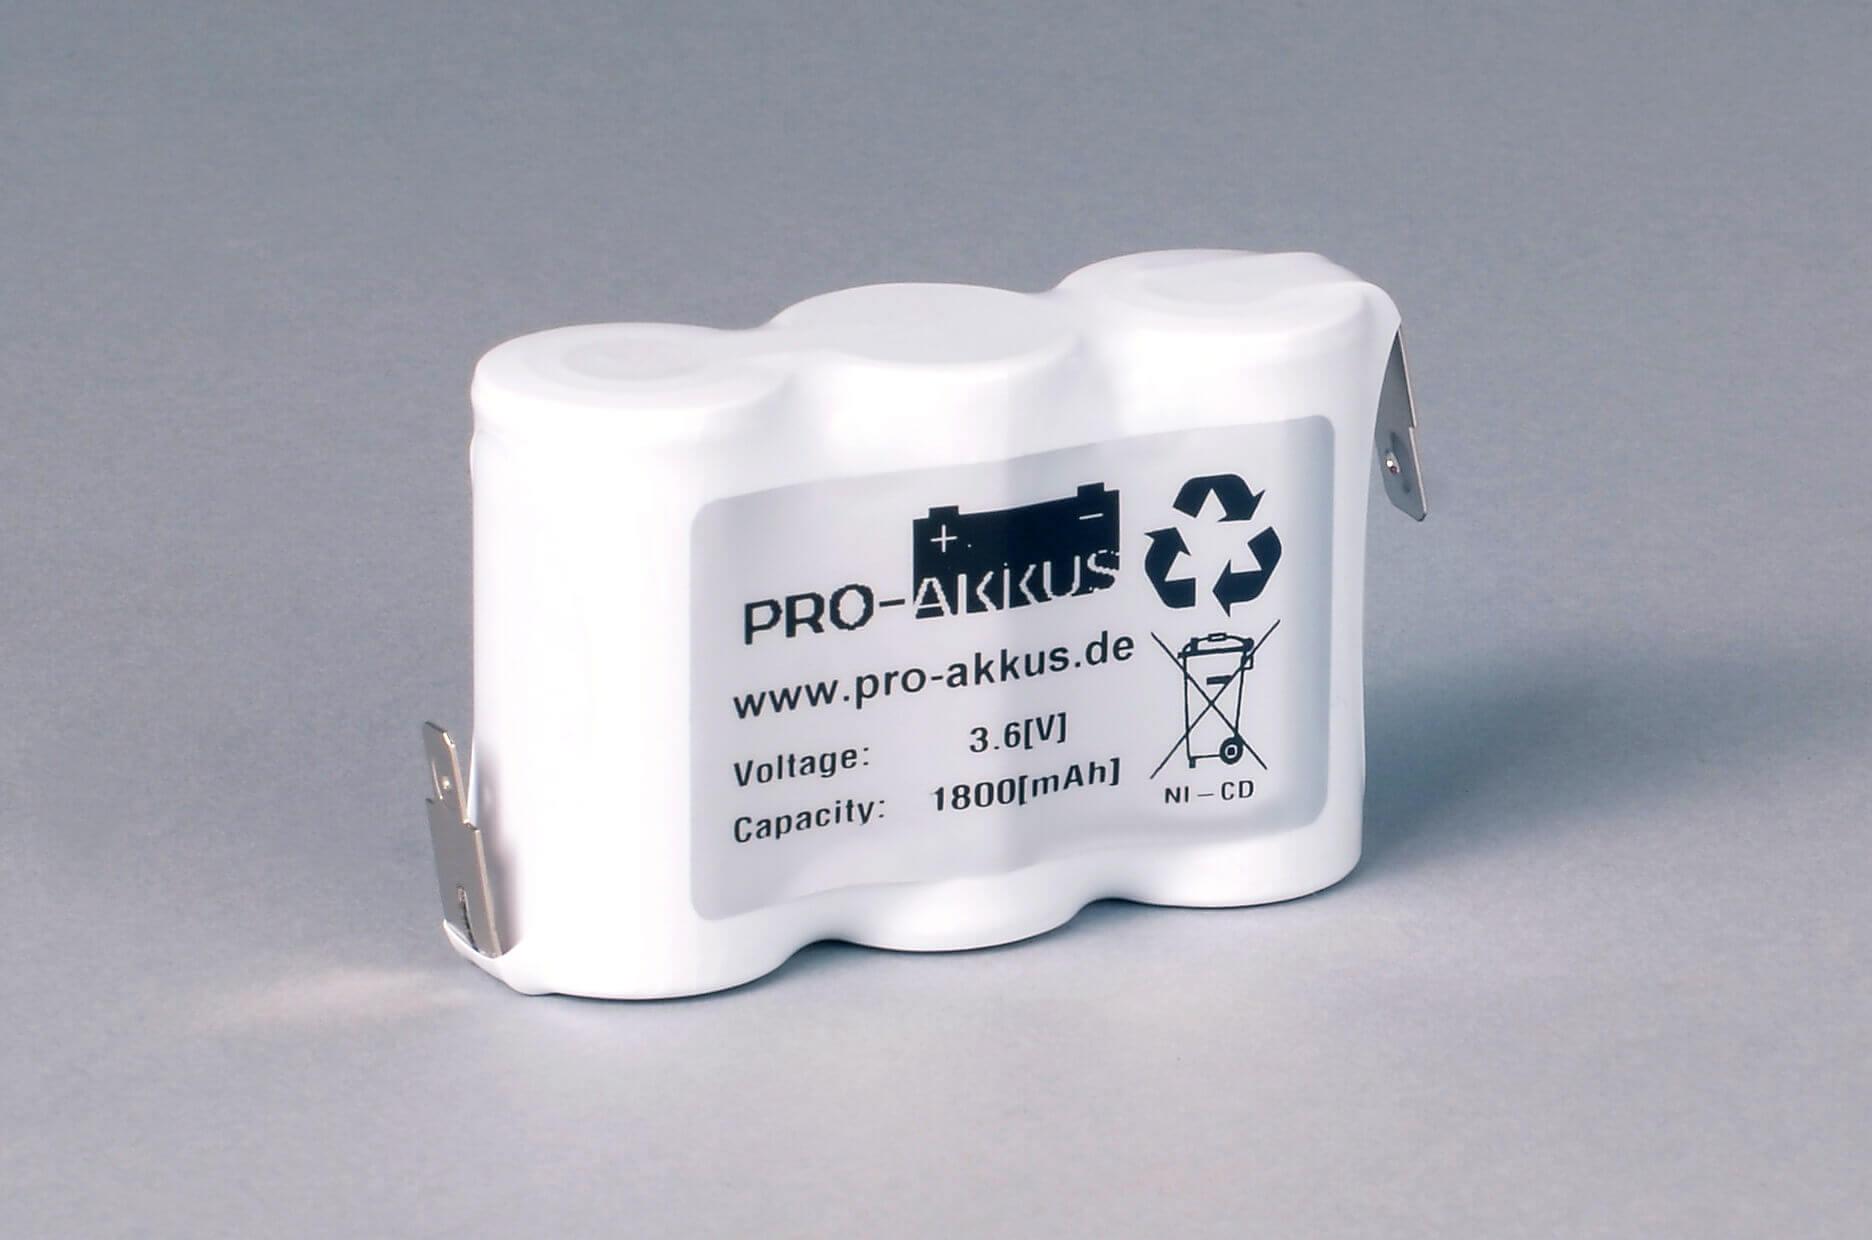 Ni-Cd Akkupack Notlicht Notbeleuchtung 3,6V / 1800mAh (1,8Ah) F3x1 Reihe, Faston Anschlüsse